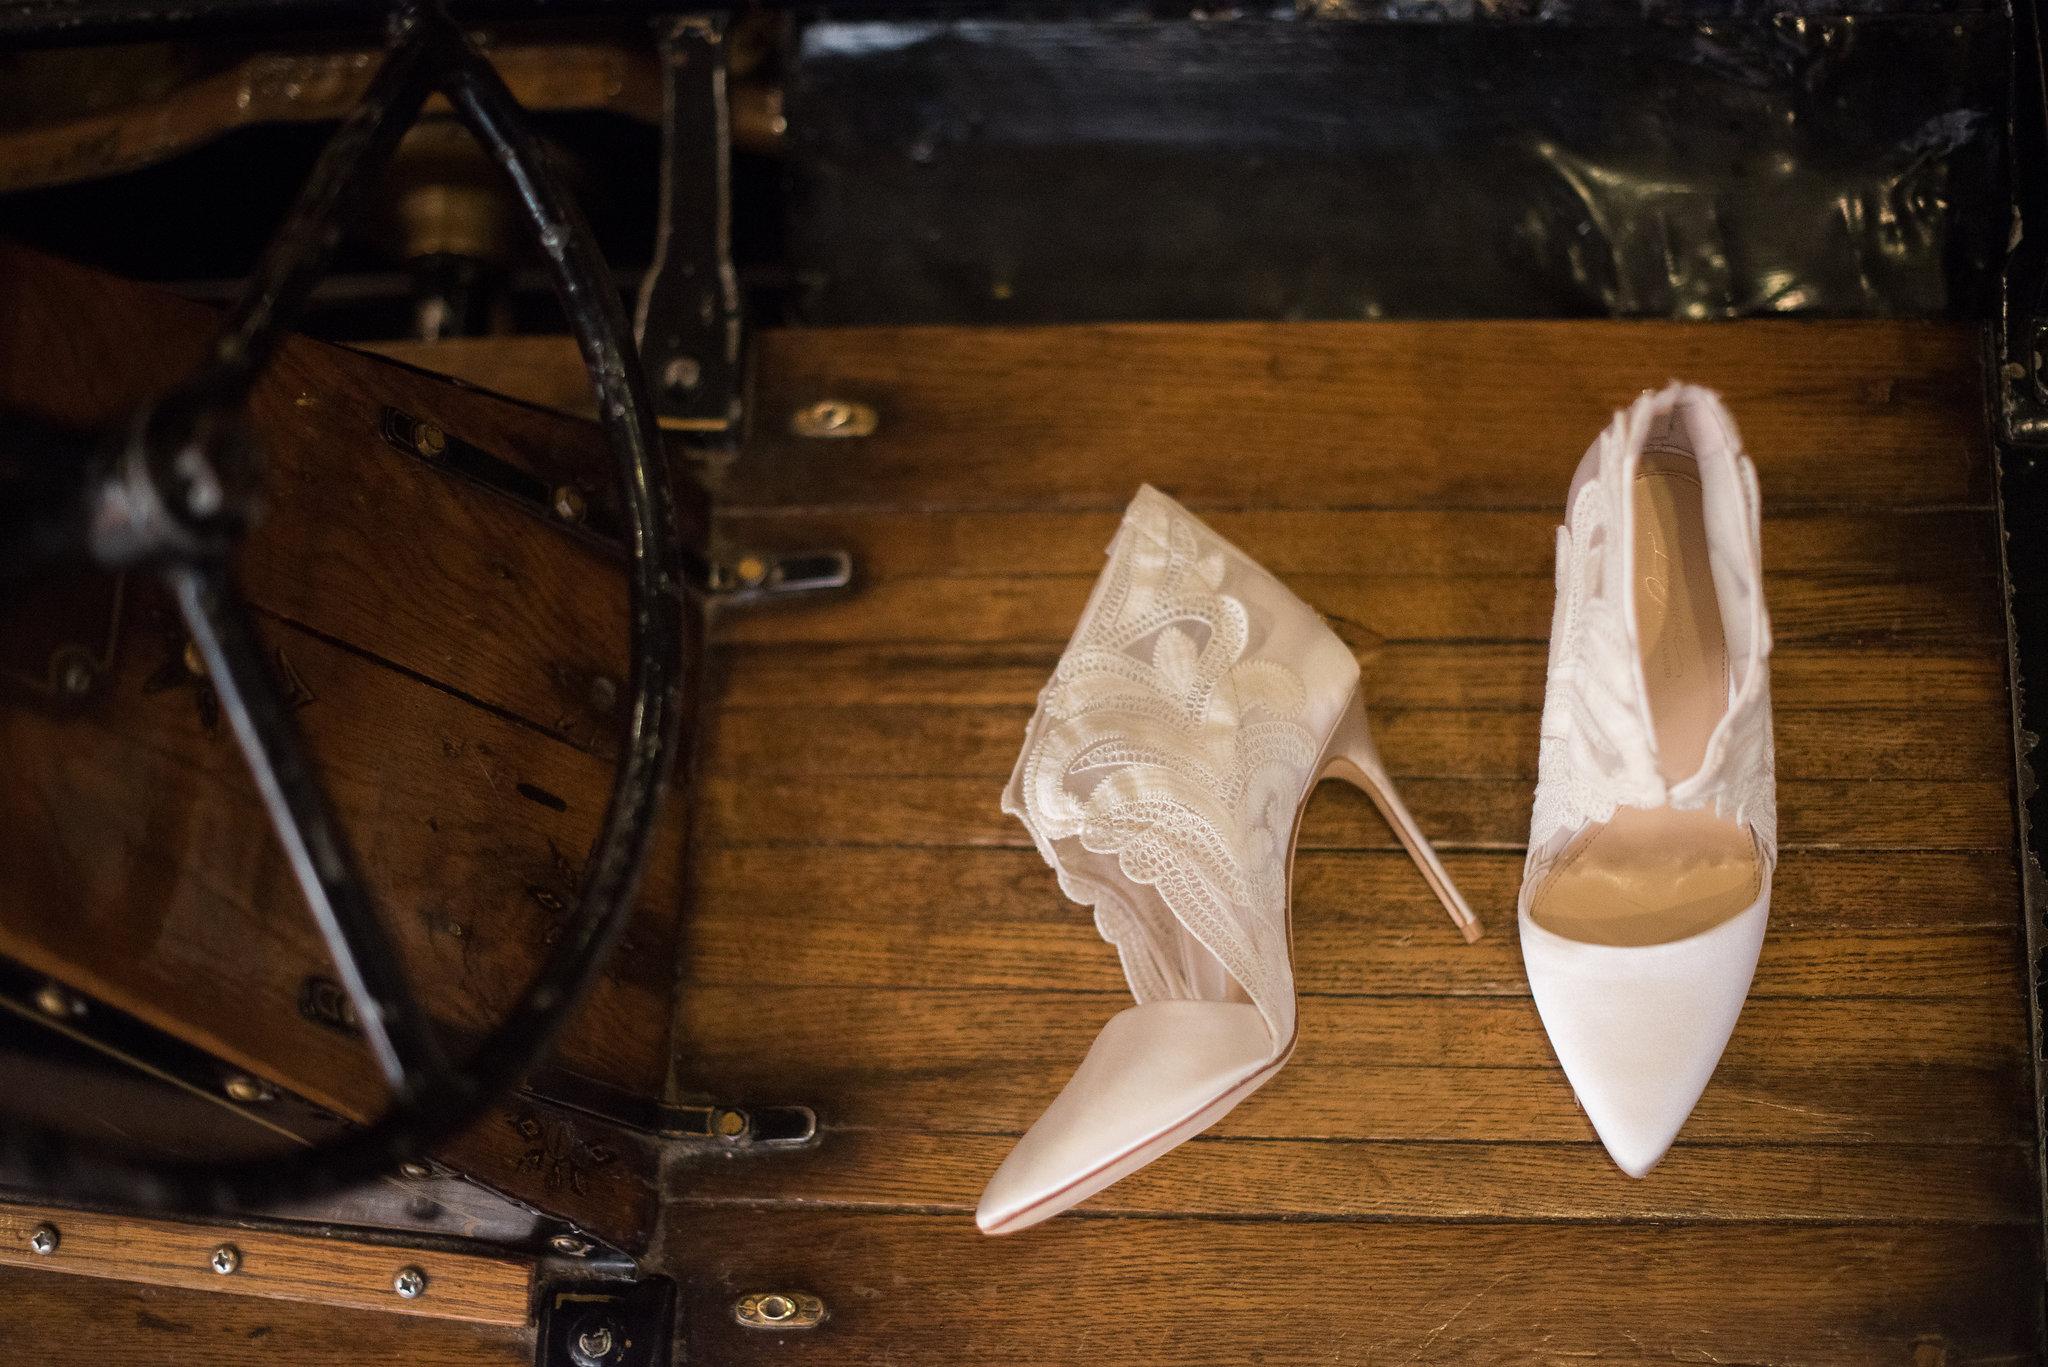 vermont-wedding-photographer-sarah-annay-photography.jpg12.jpg